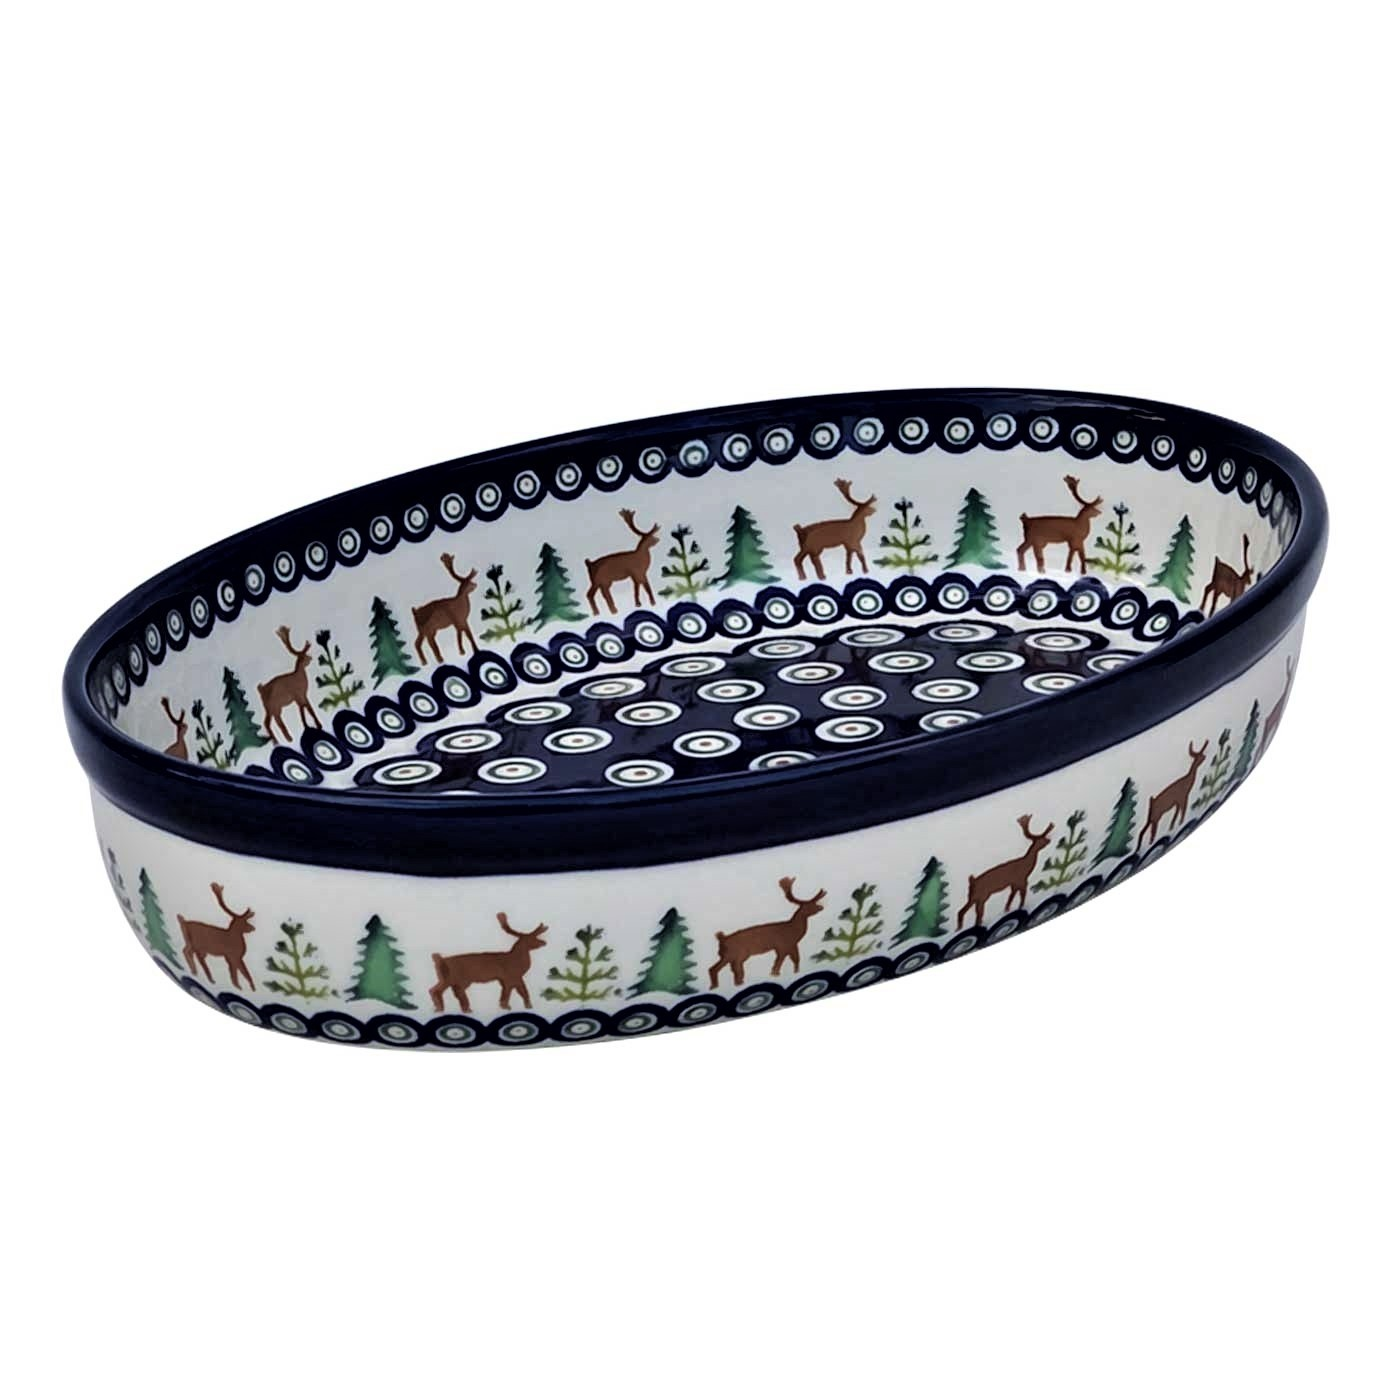 Pottery Avenue 11-inch Stoneware Oval Baker - 349-992A Caribou Lodge